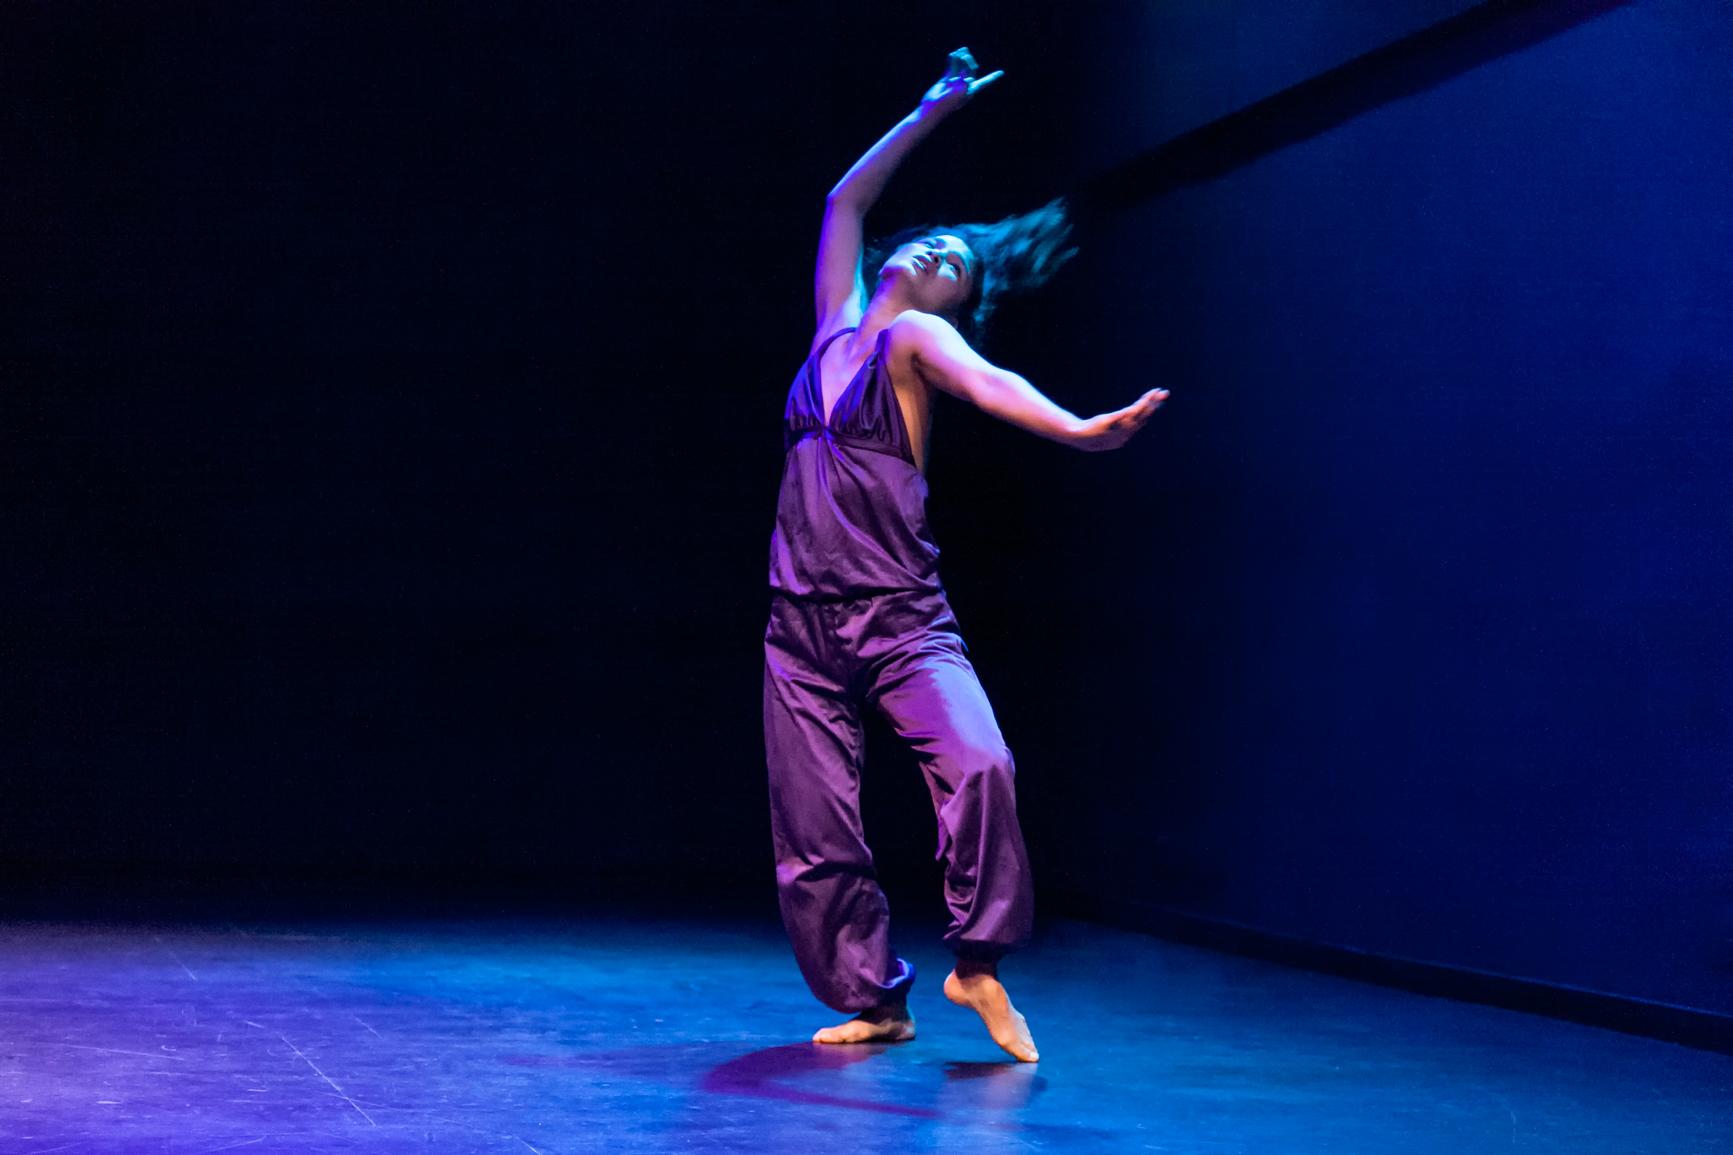 Fotografías de danza, Sachiko Fullita por Alessia Bombaci